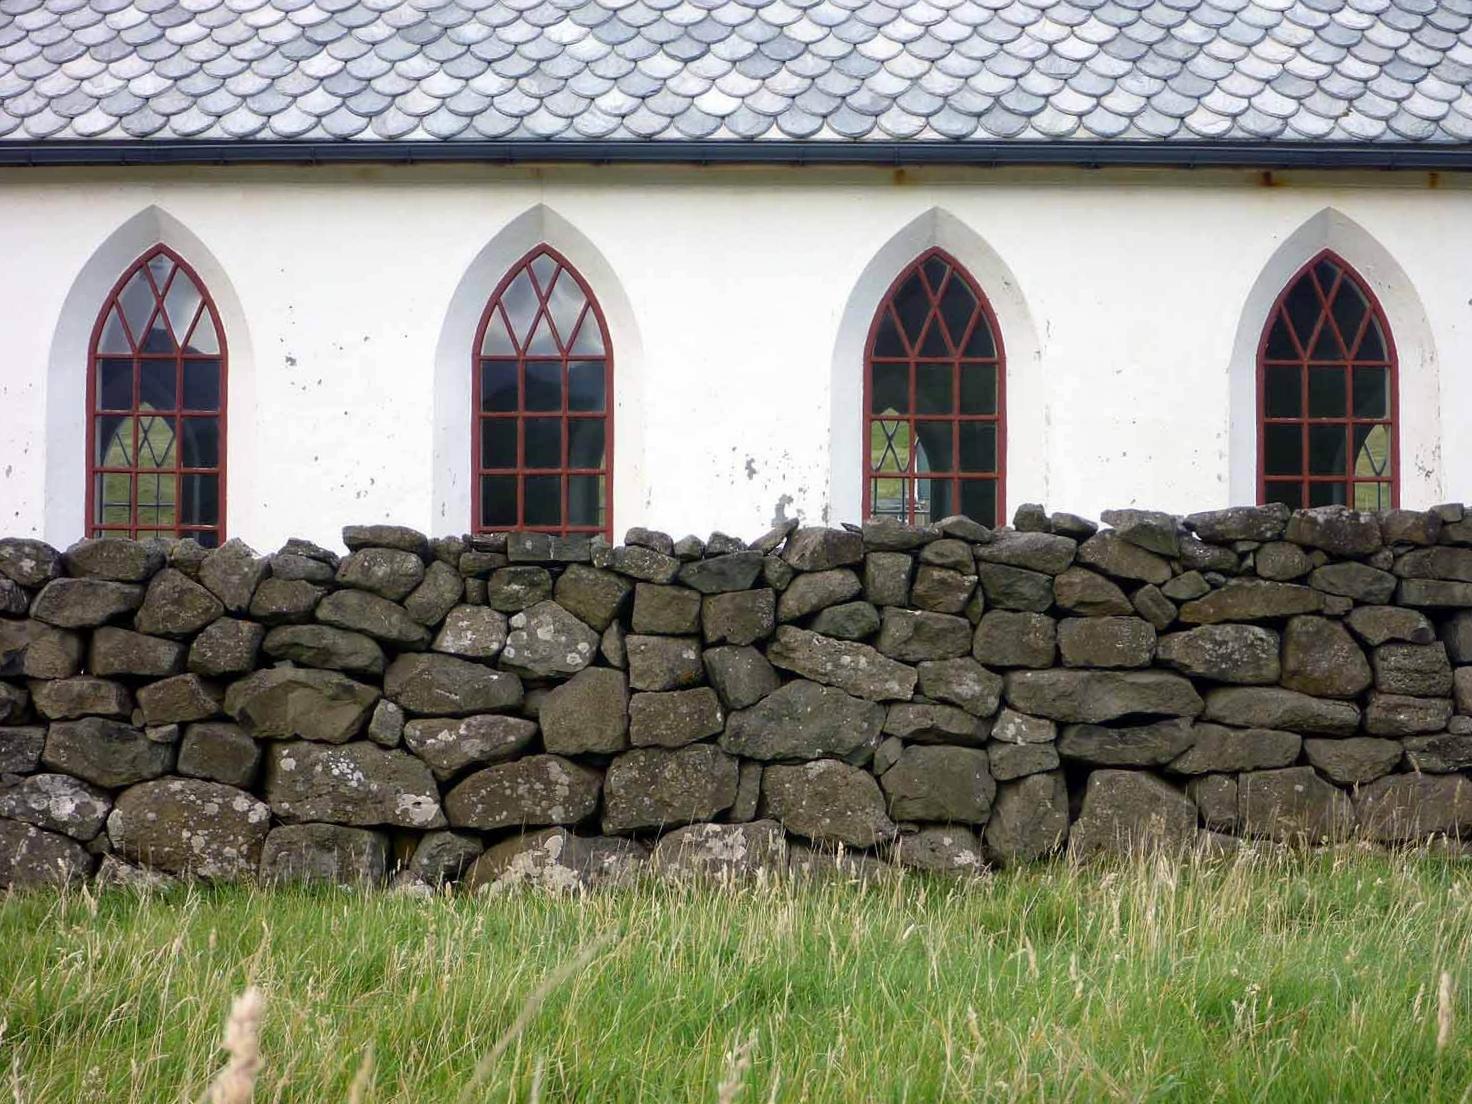 denmark-faroe-islands-vidoy-vidareidi-viðareiði-kirkja-stone-walls-windows-gothic-arch.JPG